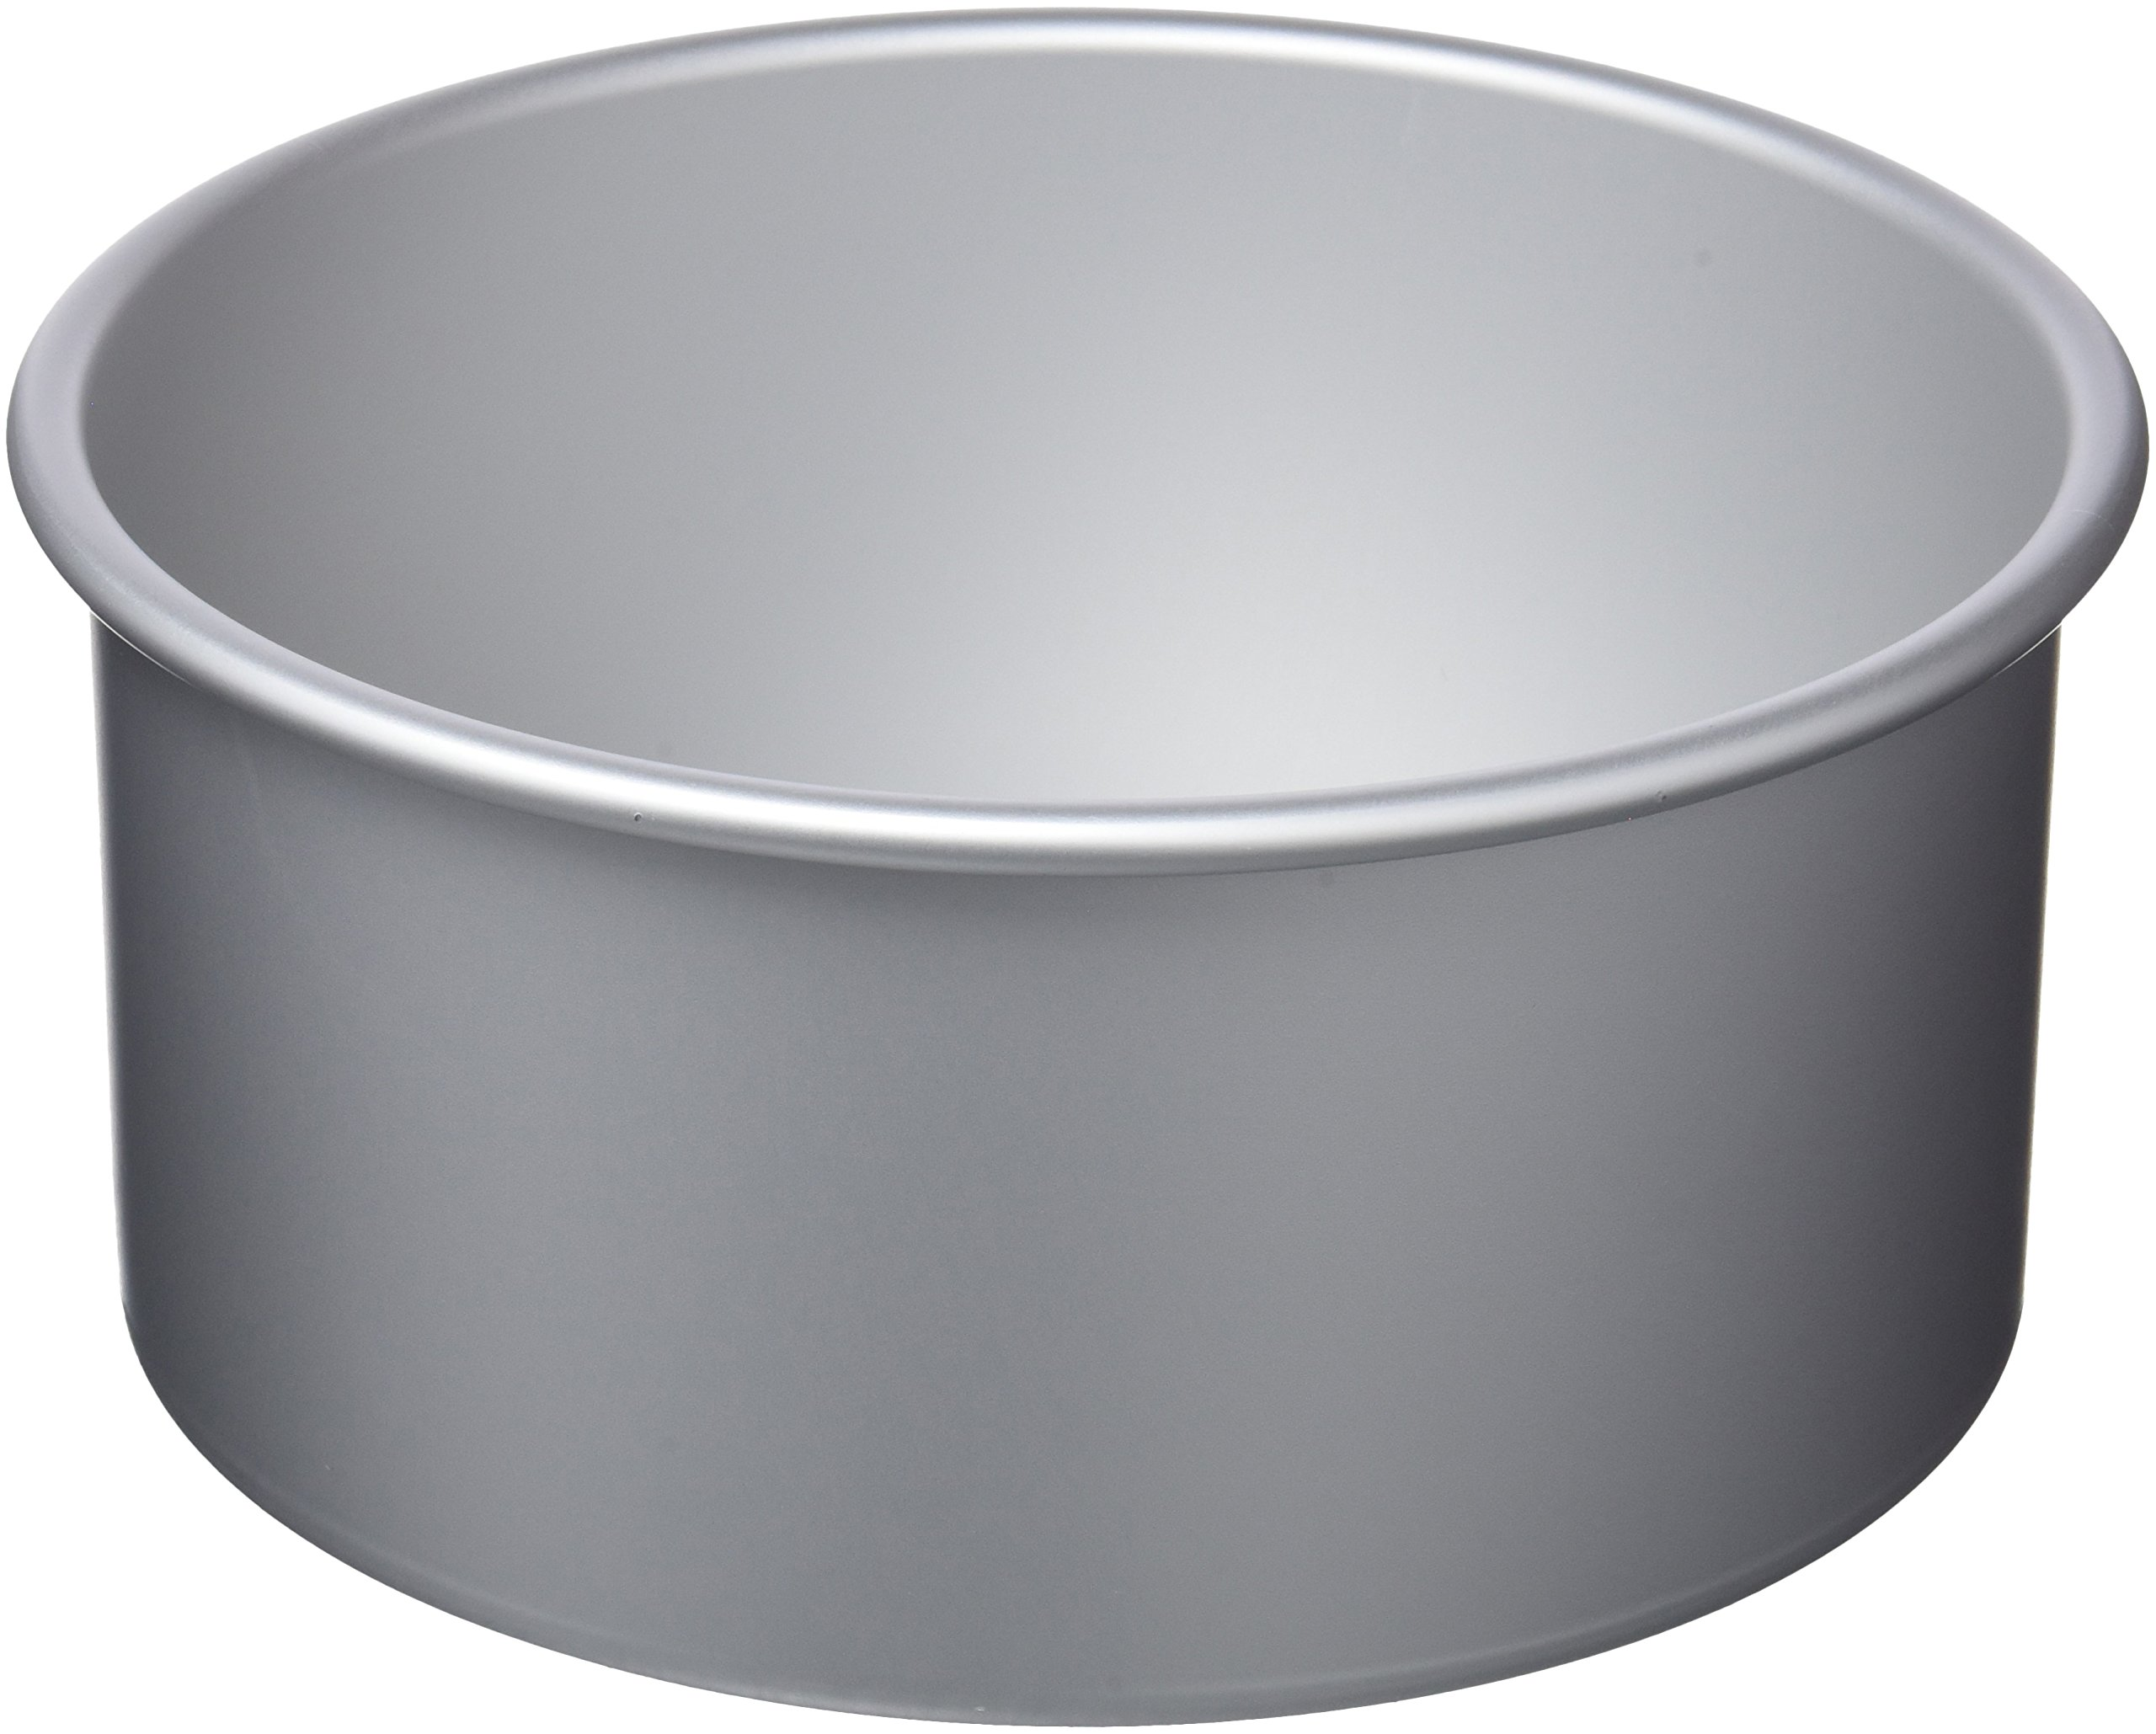 IBILI 815120 - Molde Redondo Recto Extra Alto 20X10 Cm product image